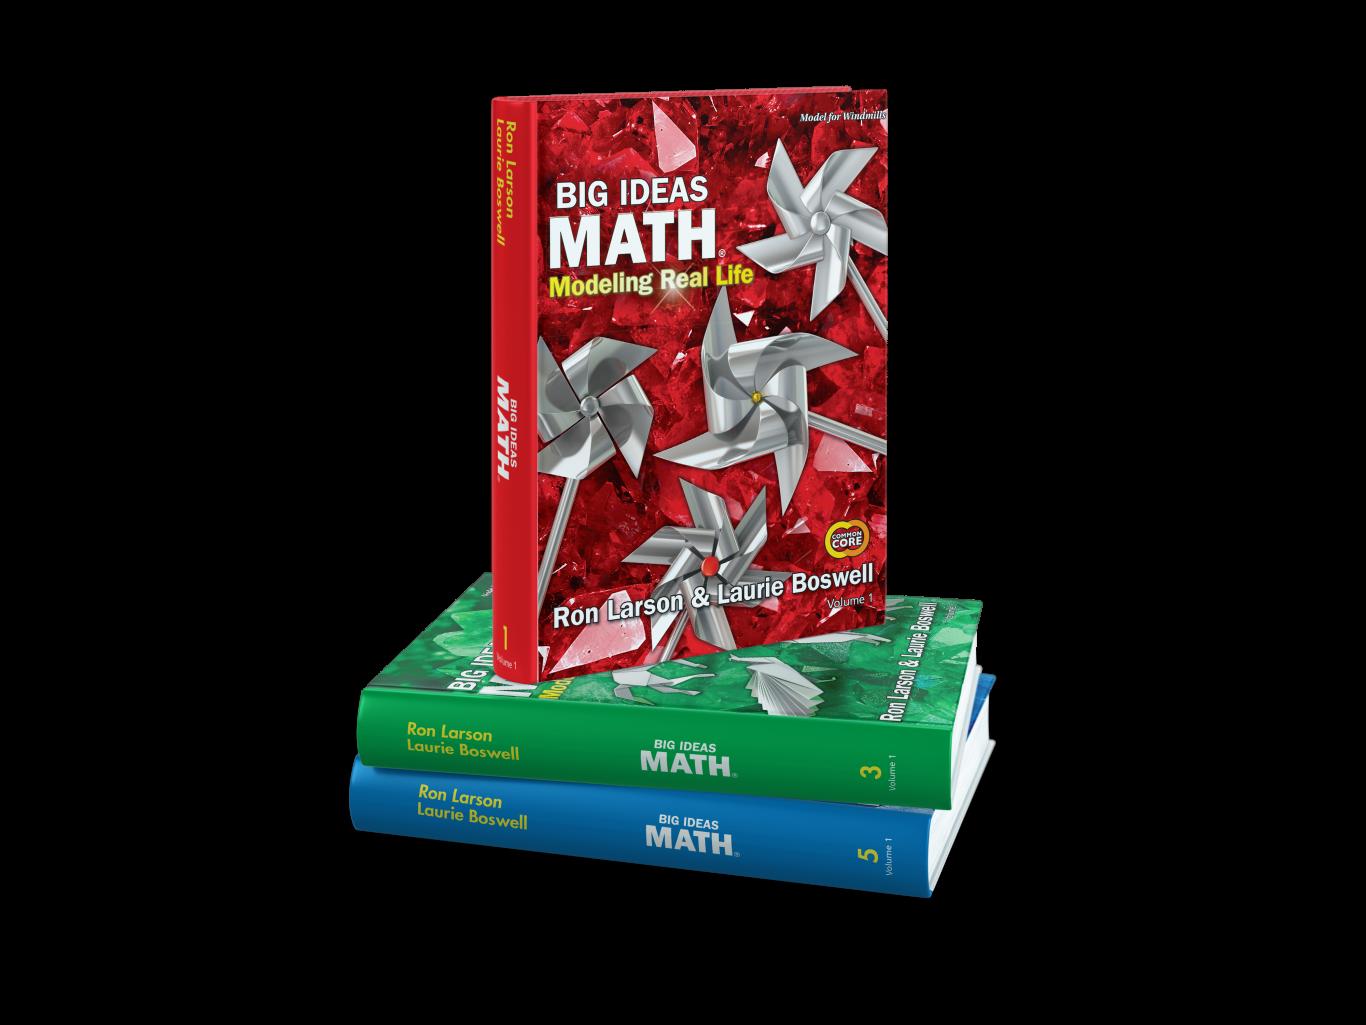 Big Ideas Math Modeling Real Life Elementary School